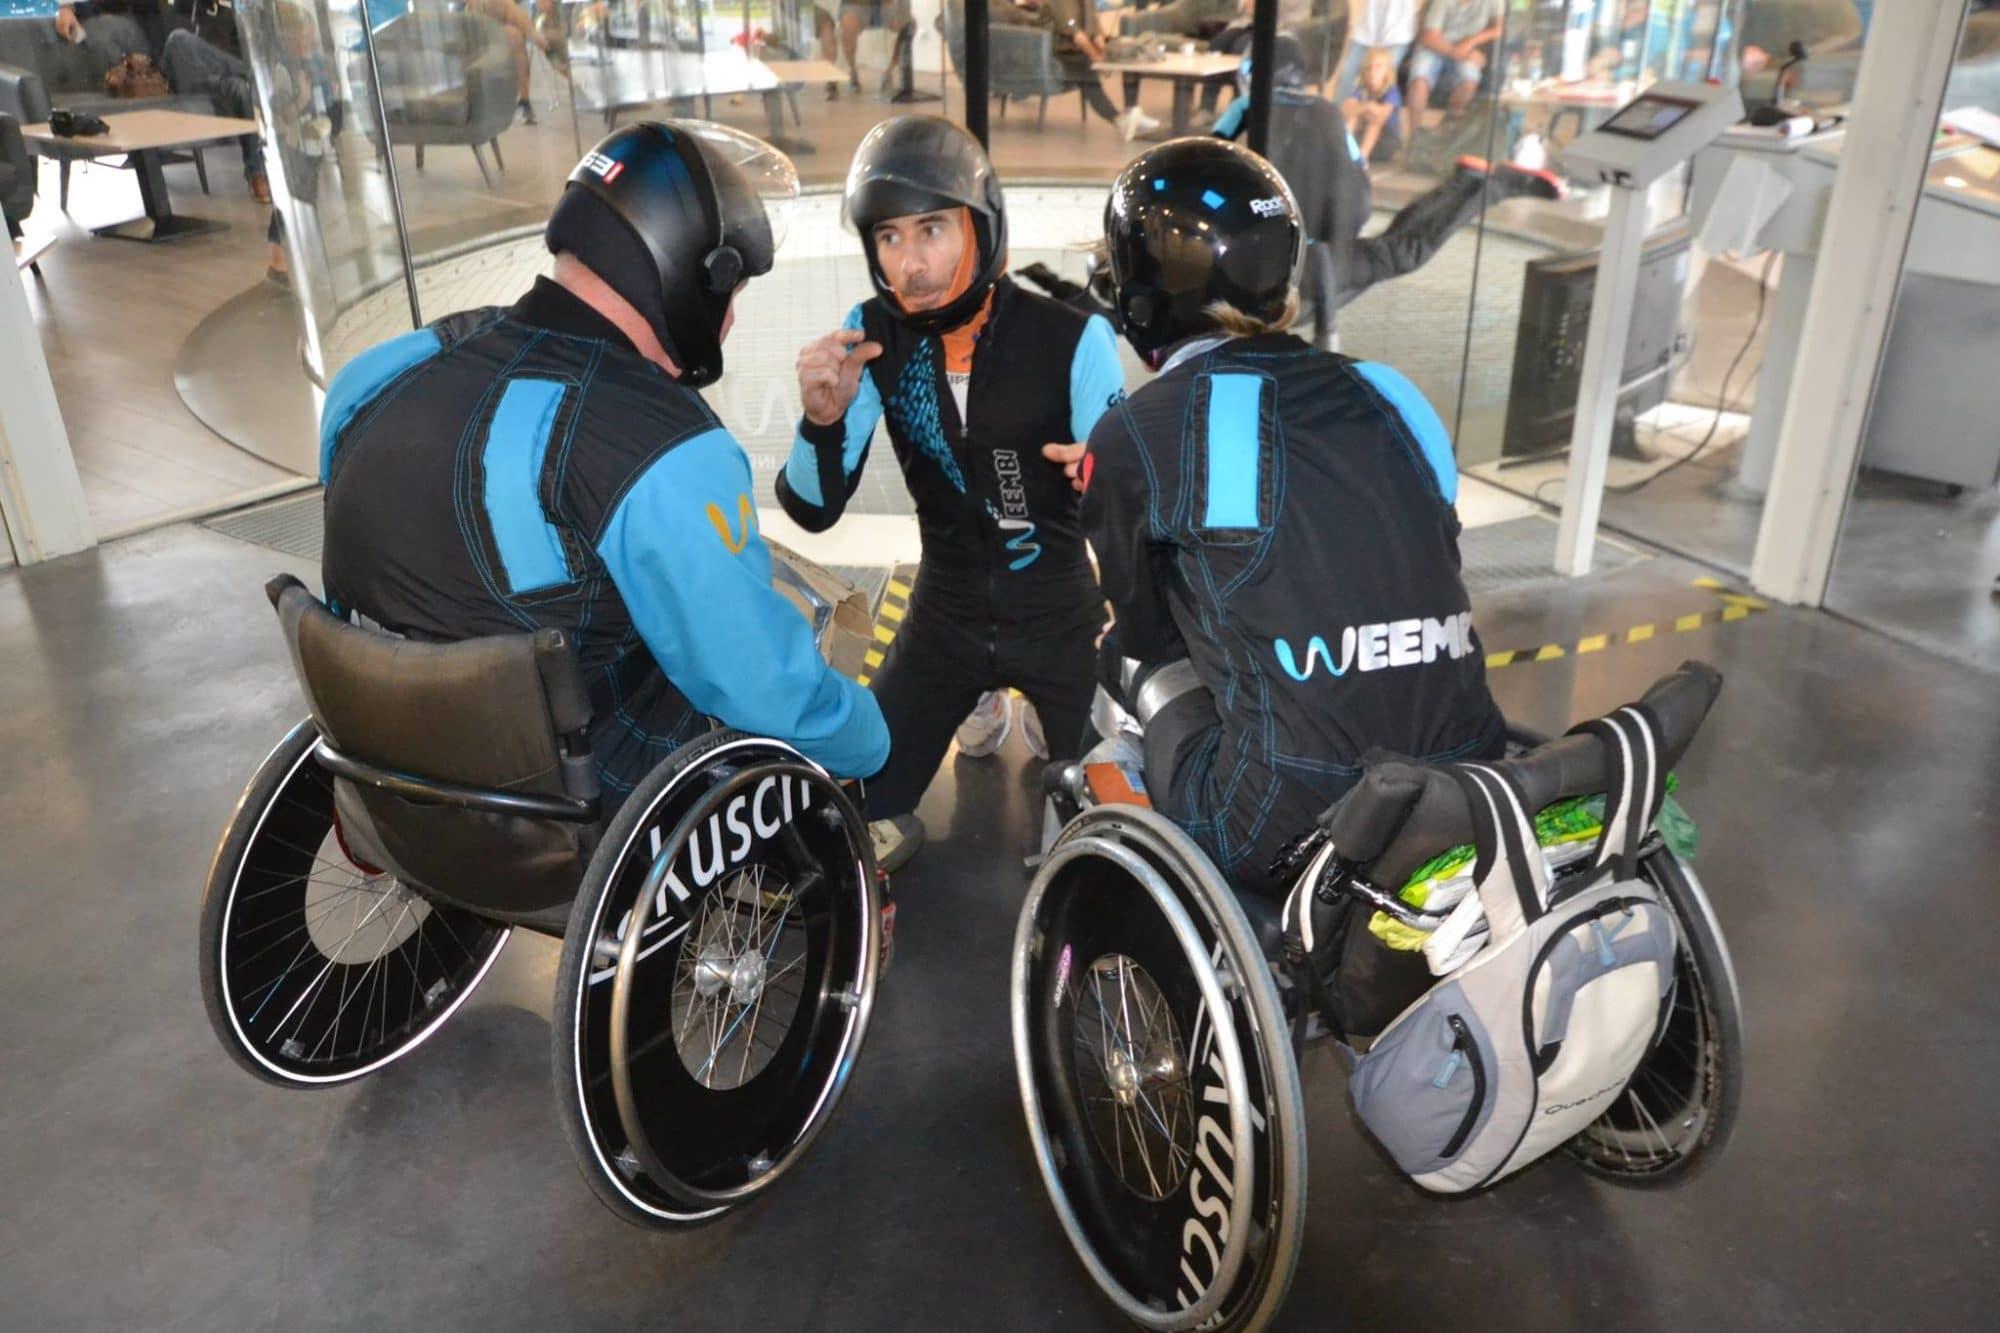 WEEMBI, partenaire du Handifly Euro Challenge